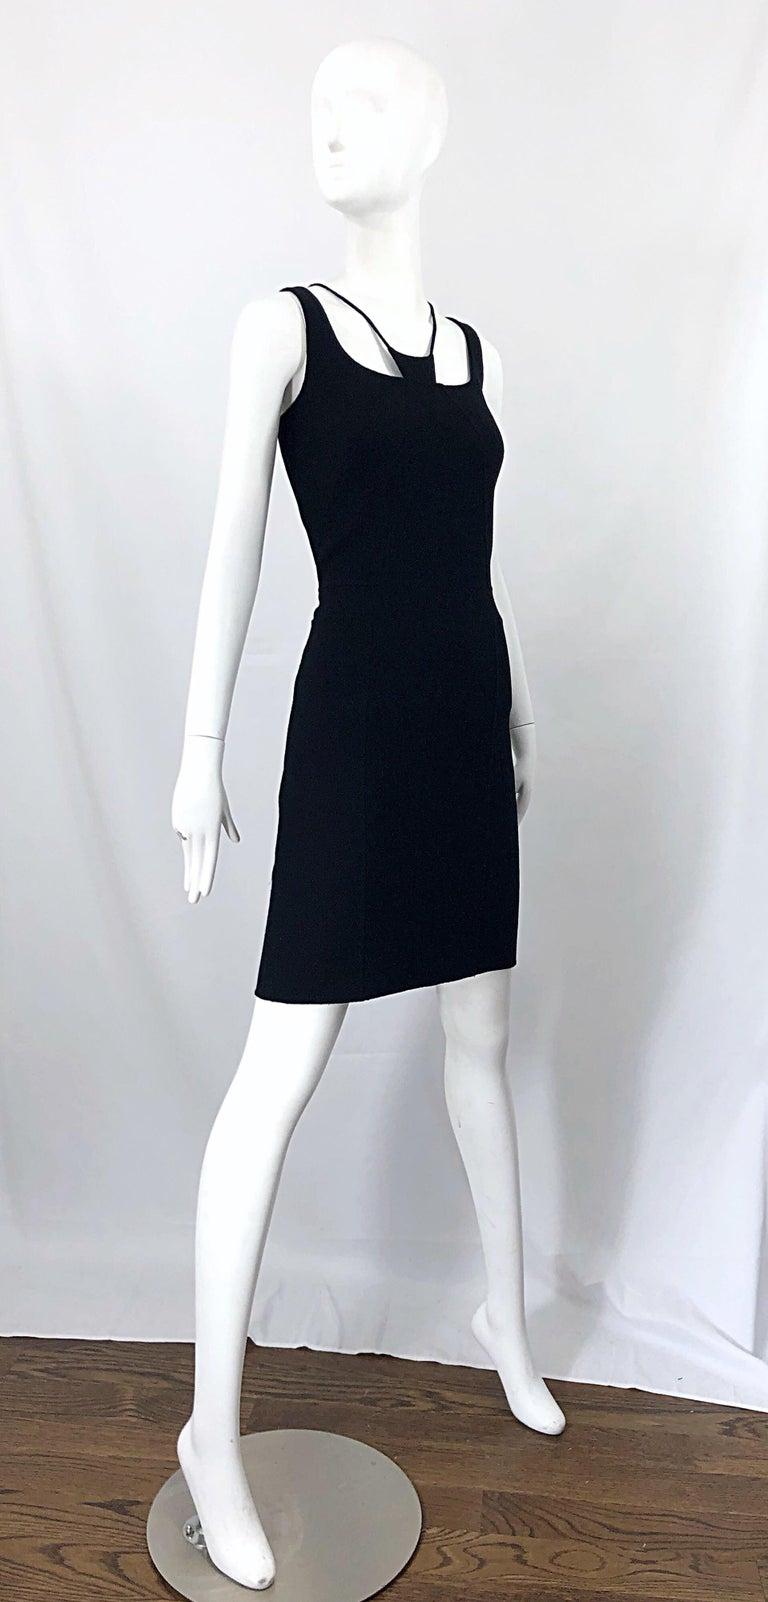 1990s Chado Ralph Rucci Rare Black Wool ' Bondage ' Vintage 90s Dress Size 4  For Sale 6